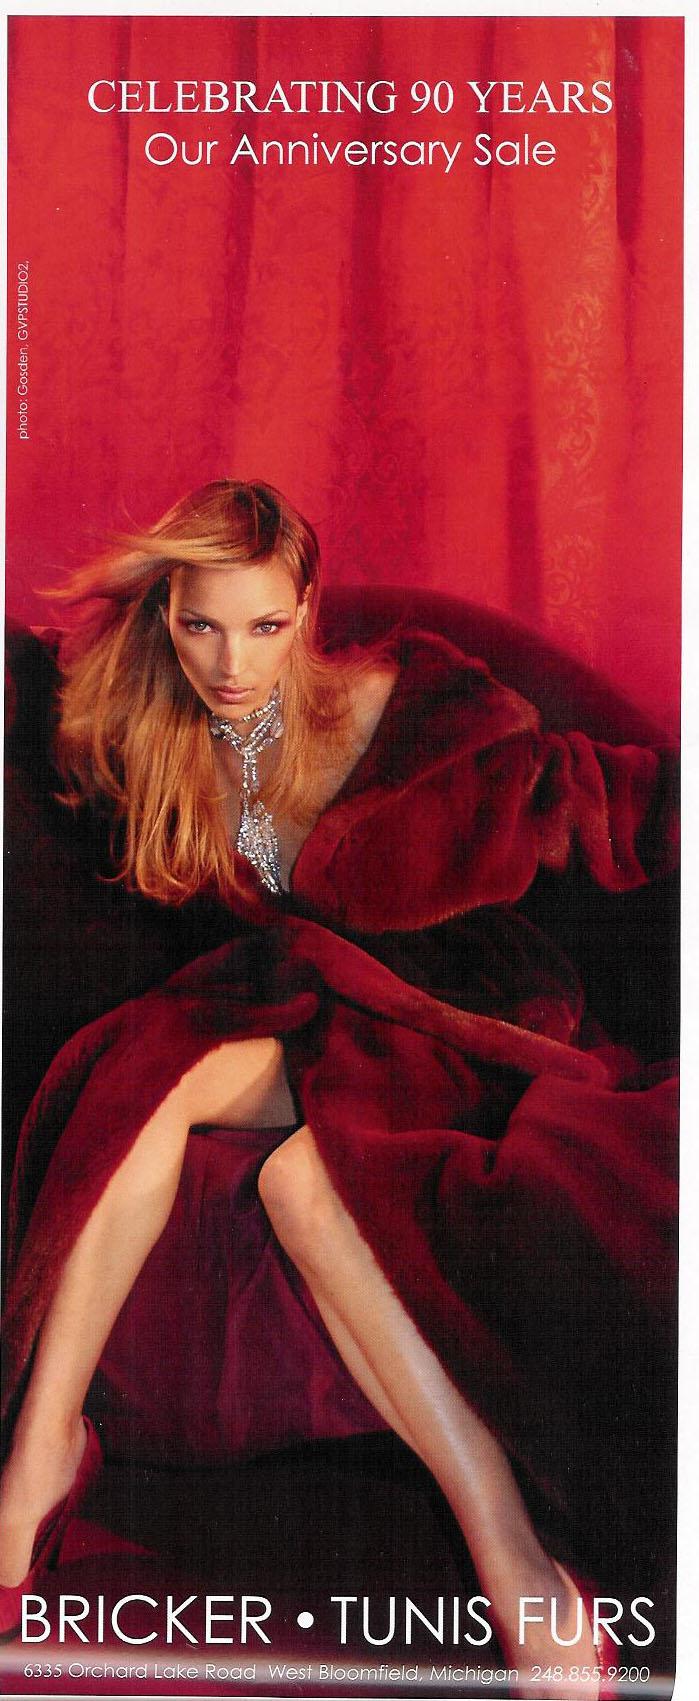 Jan 04, 2007 Photographer: Gosden Ad in Ambassador Magazine